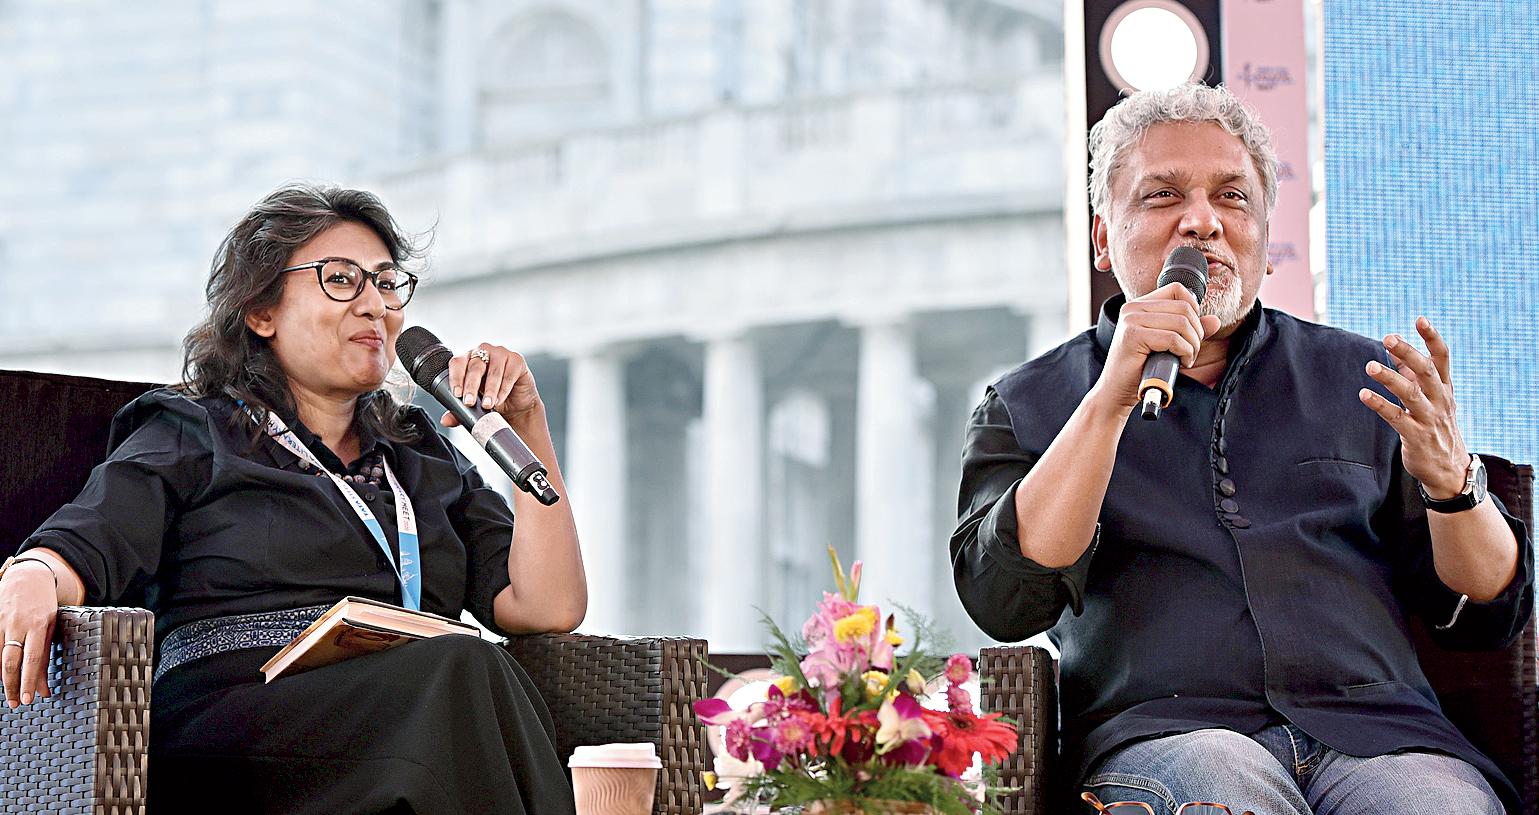 Jash Sen and Kunal Basu at Victoria Memorial for Tata Steel Kolkata Literary Meet on January 22.